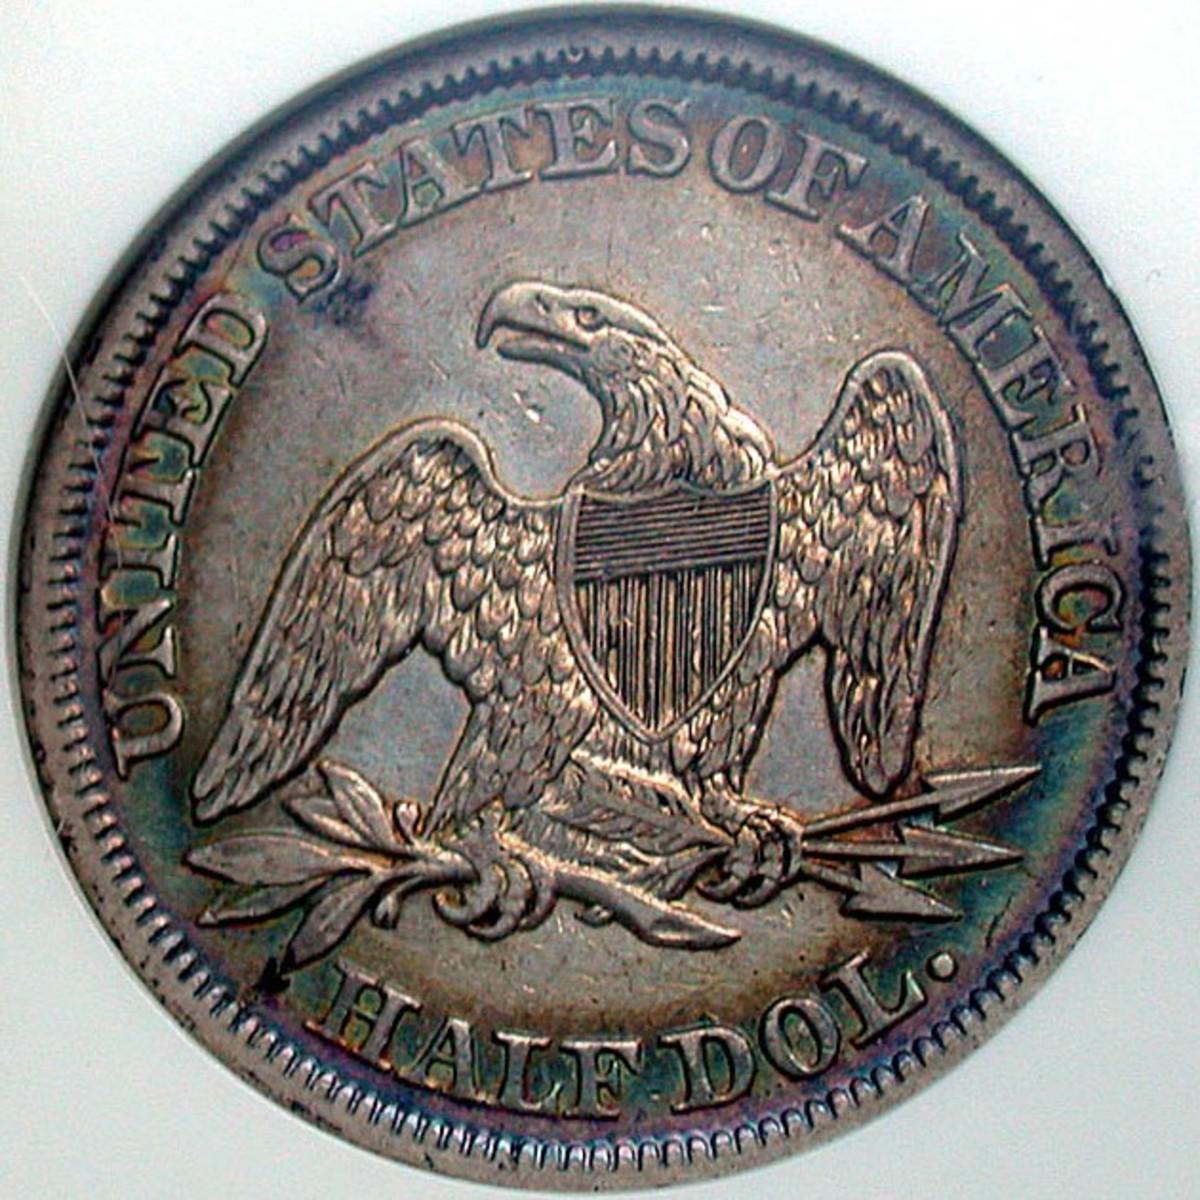 Seated Liberty Half Dollar Reverse. Photo Courtesy: coinpage.com